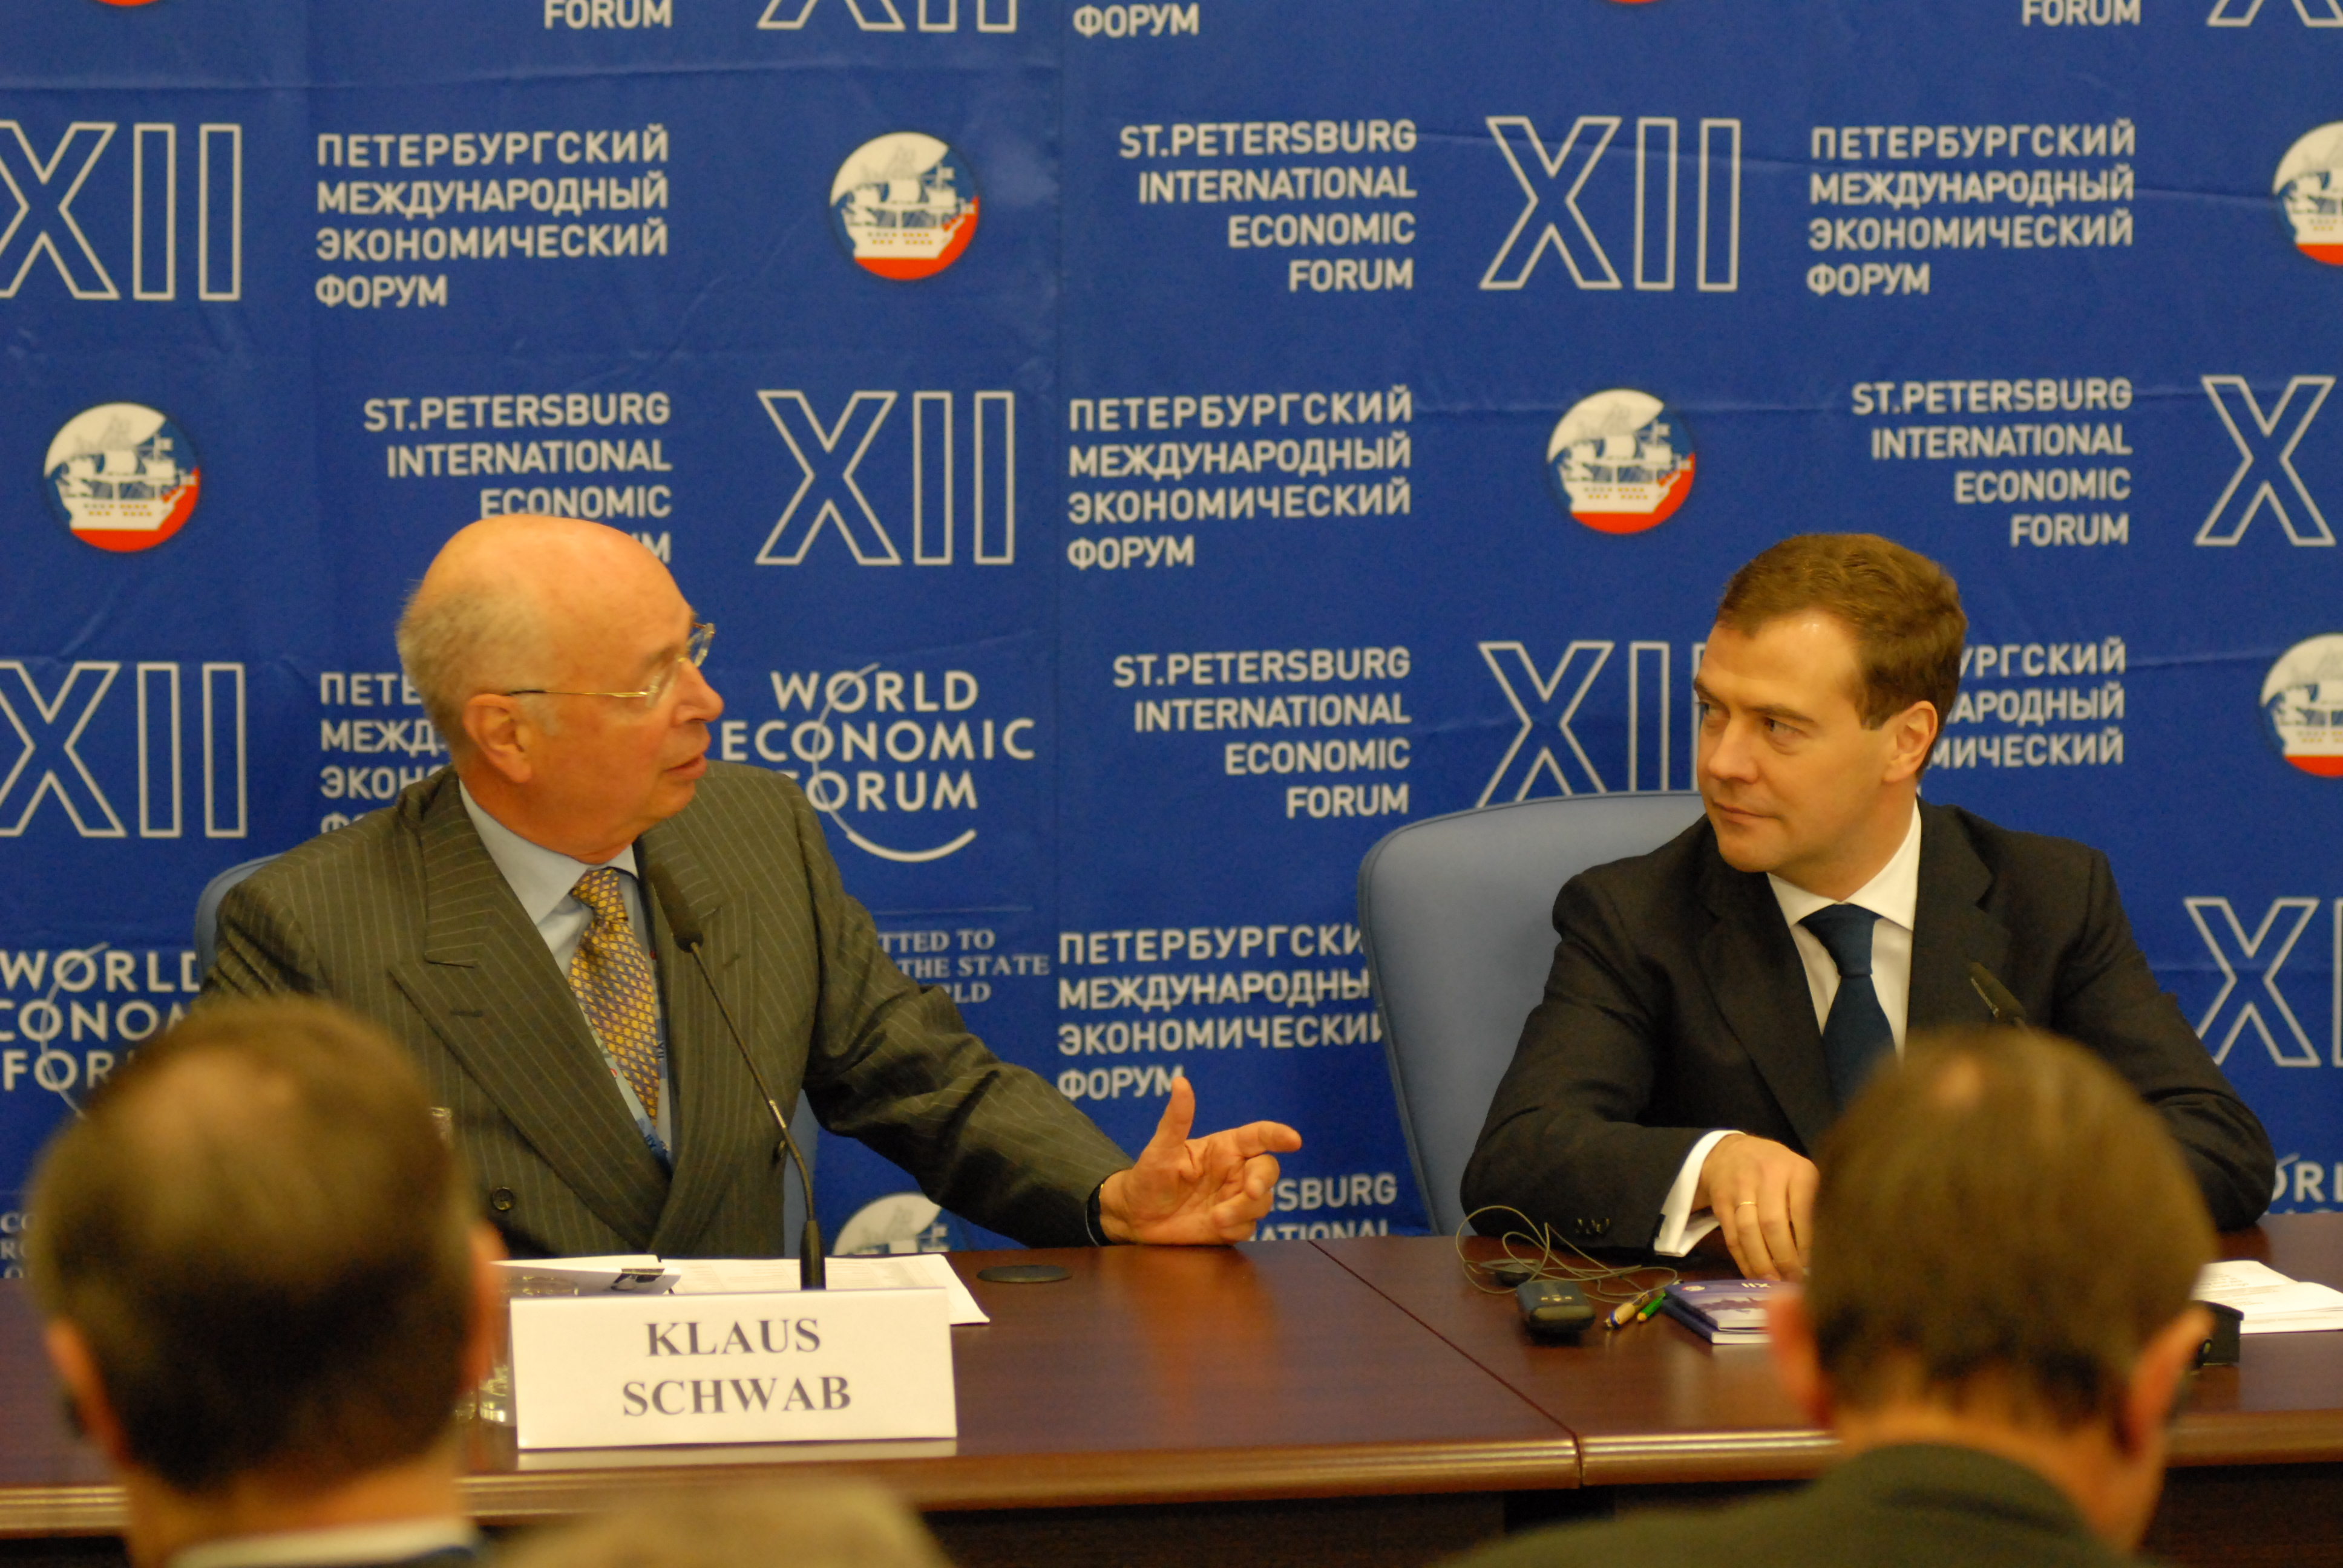 https://upload.wikimedia.org/wikipedia/commons/8/88/Flickr_-_World_Economic_Forum_-_Klaus_Schwab%2C_Dmitry_Medvedev_-_Russia_CEO_Roundtable_2008_(4).jpg